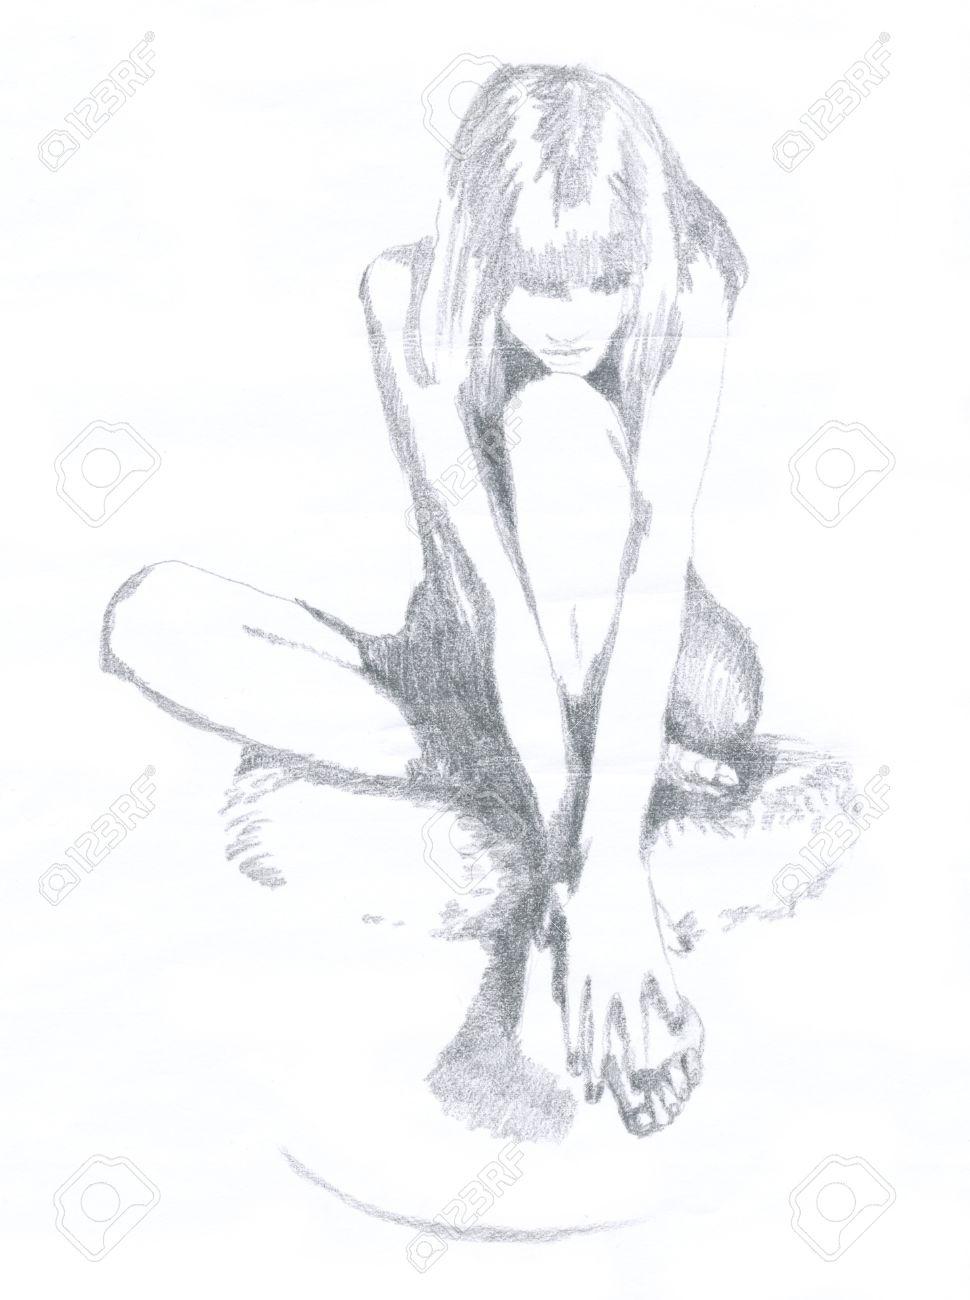 Mujer Desnuda Dibujo A Mano Técnica Original Lápiz